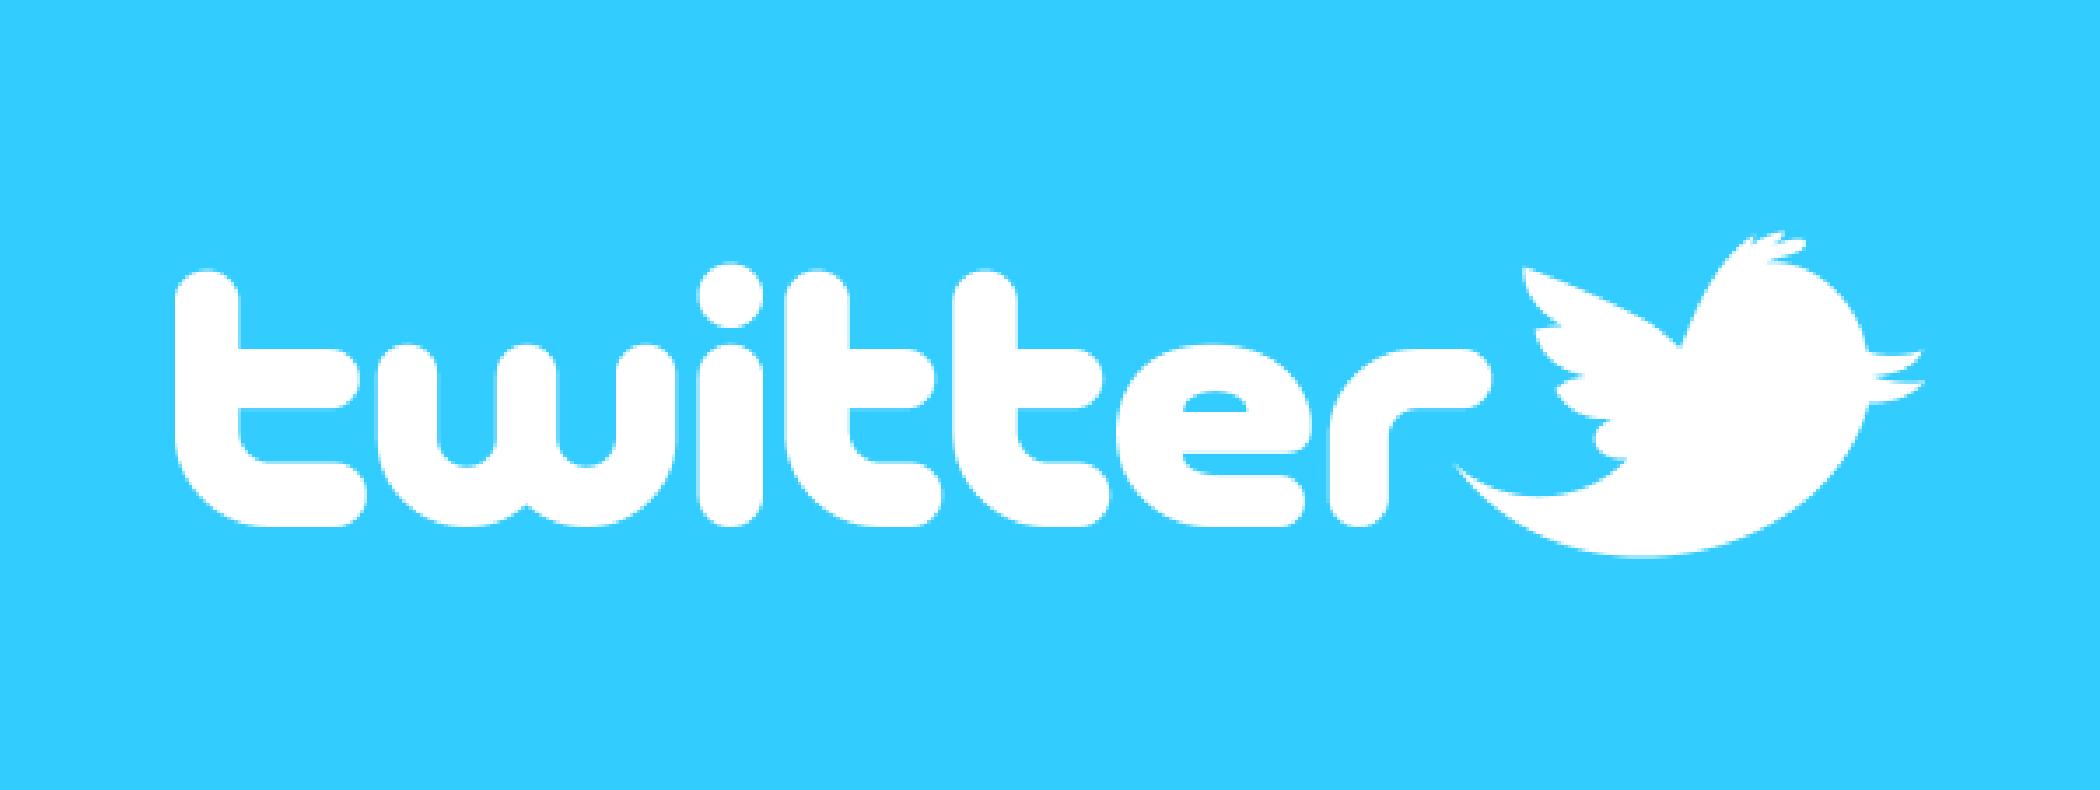 como divulgar blog no twitter